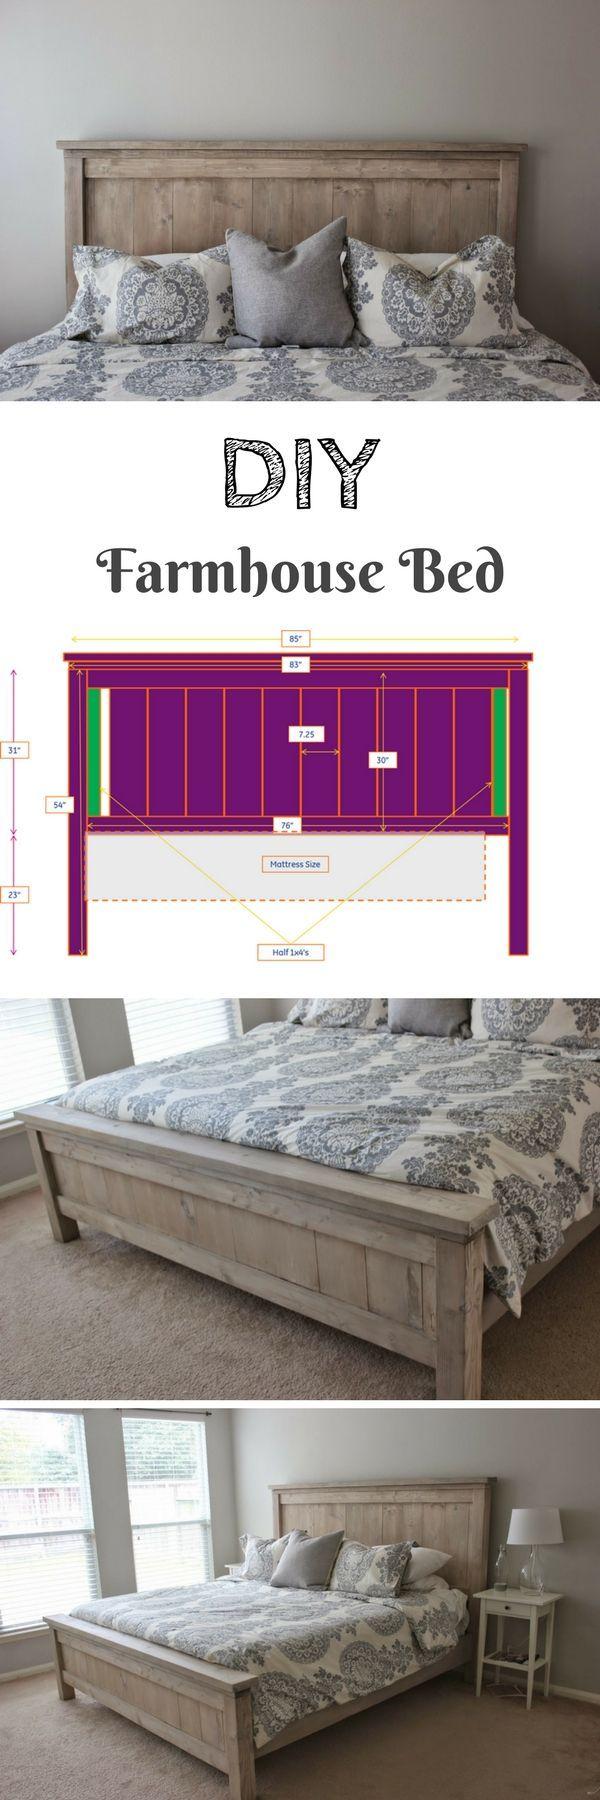 12+ Irresistible Wood Working Furniture Ideas Diy bed